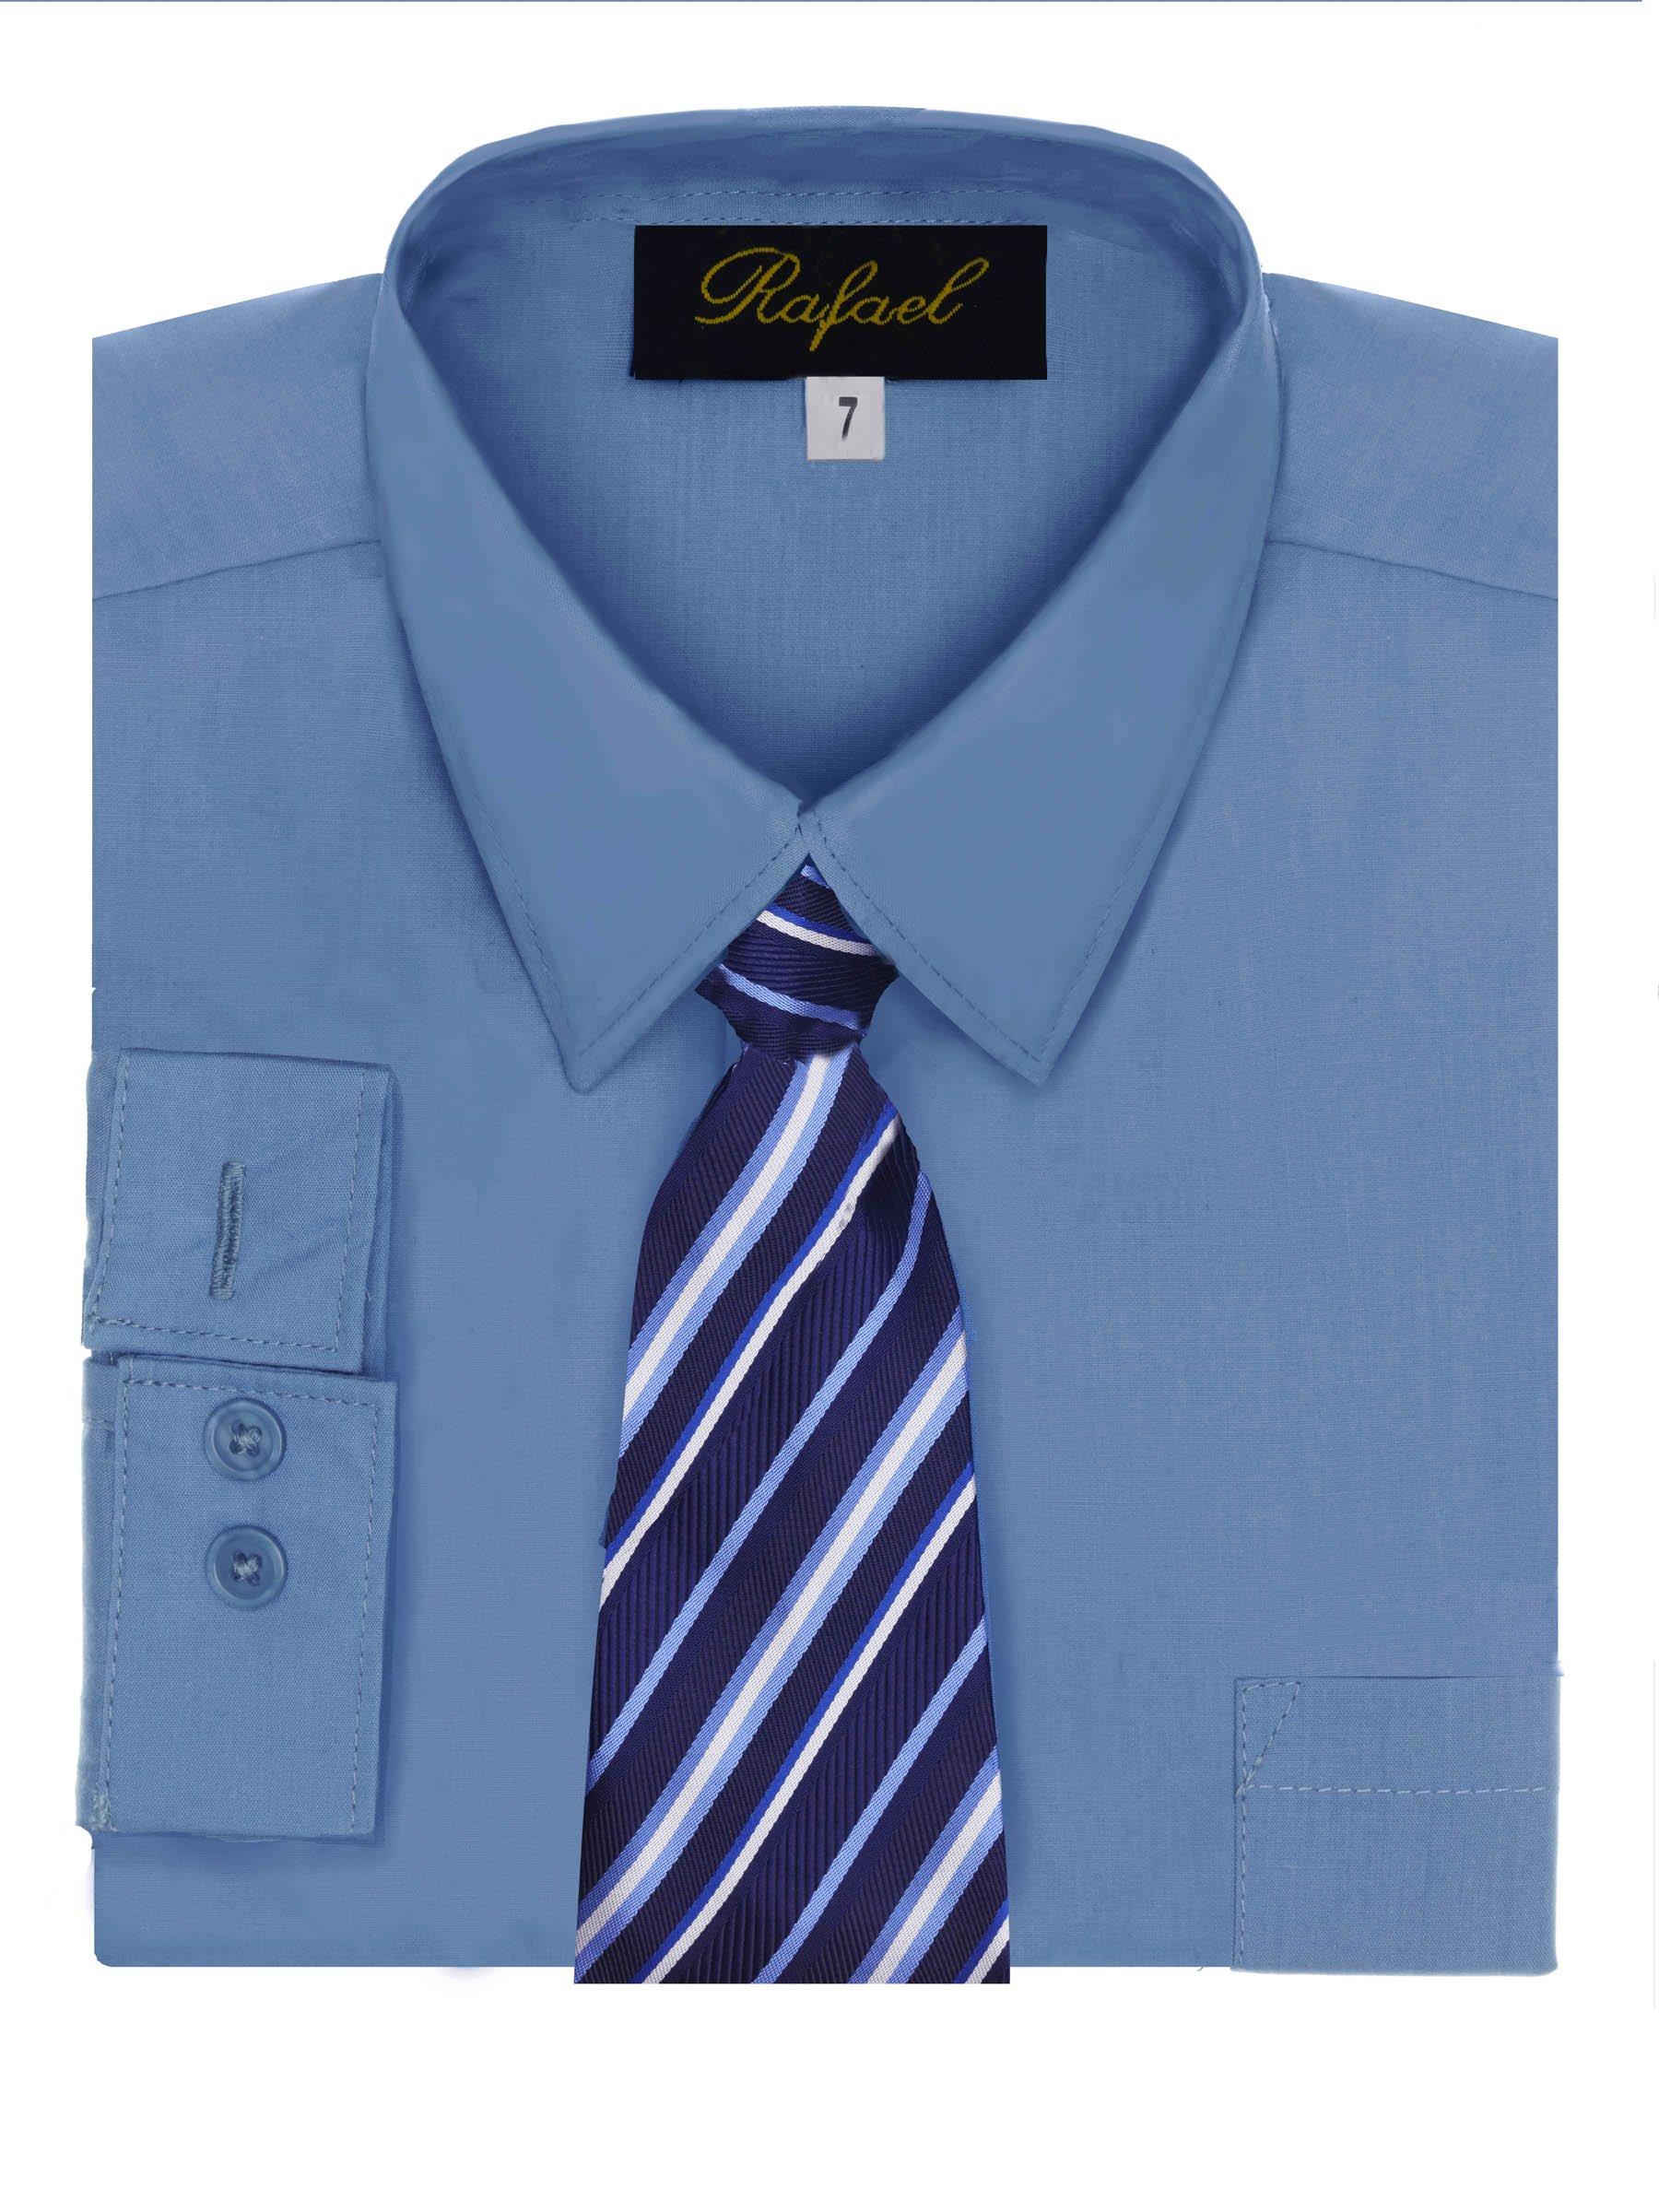 Boy's Dress Shirt & Tie - Crystal Blue, 14